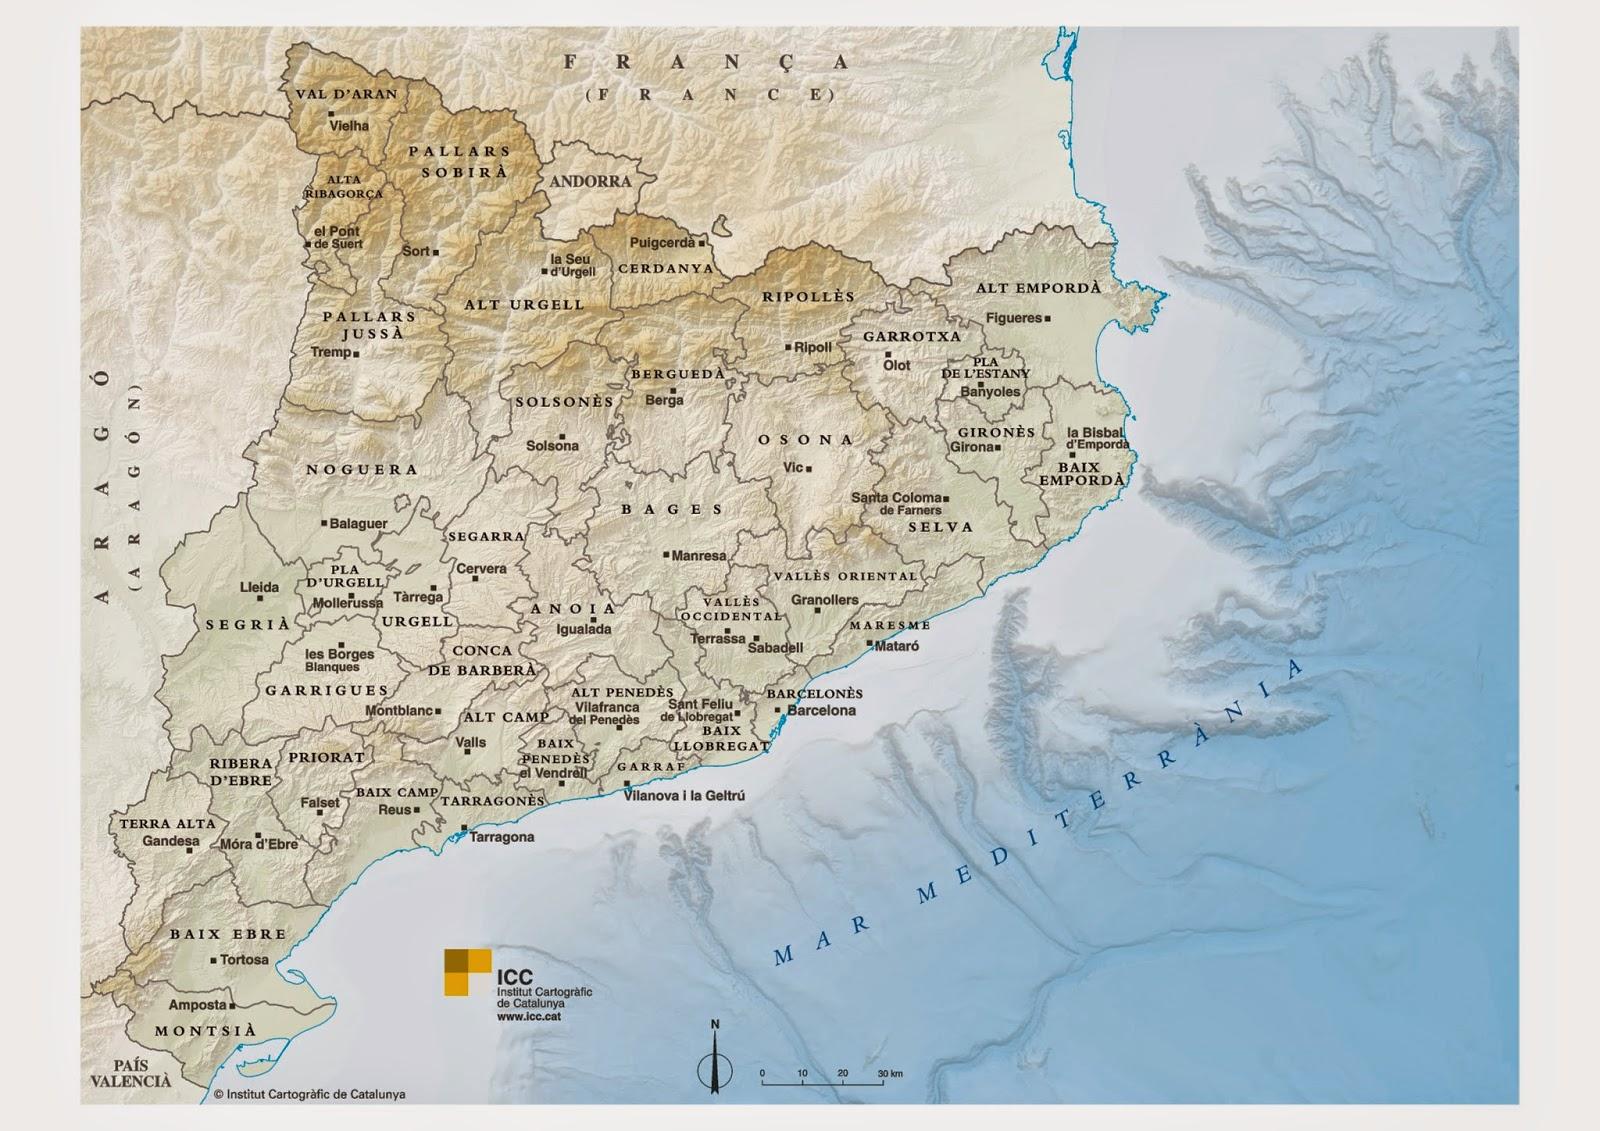 http://www.icc.cat/cat/Home-ICC/Mapes-escolars-i-divulgacio/Mapes-escolars